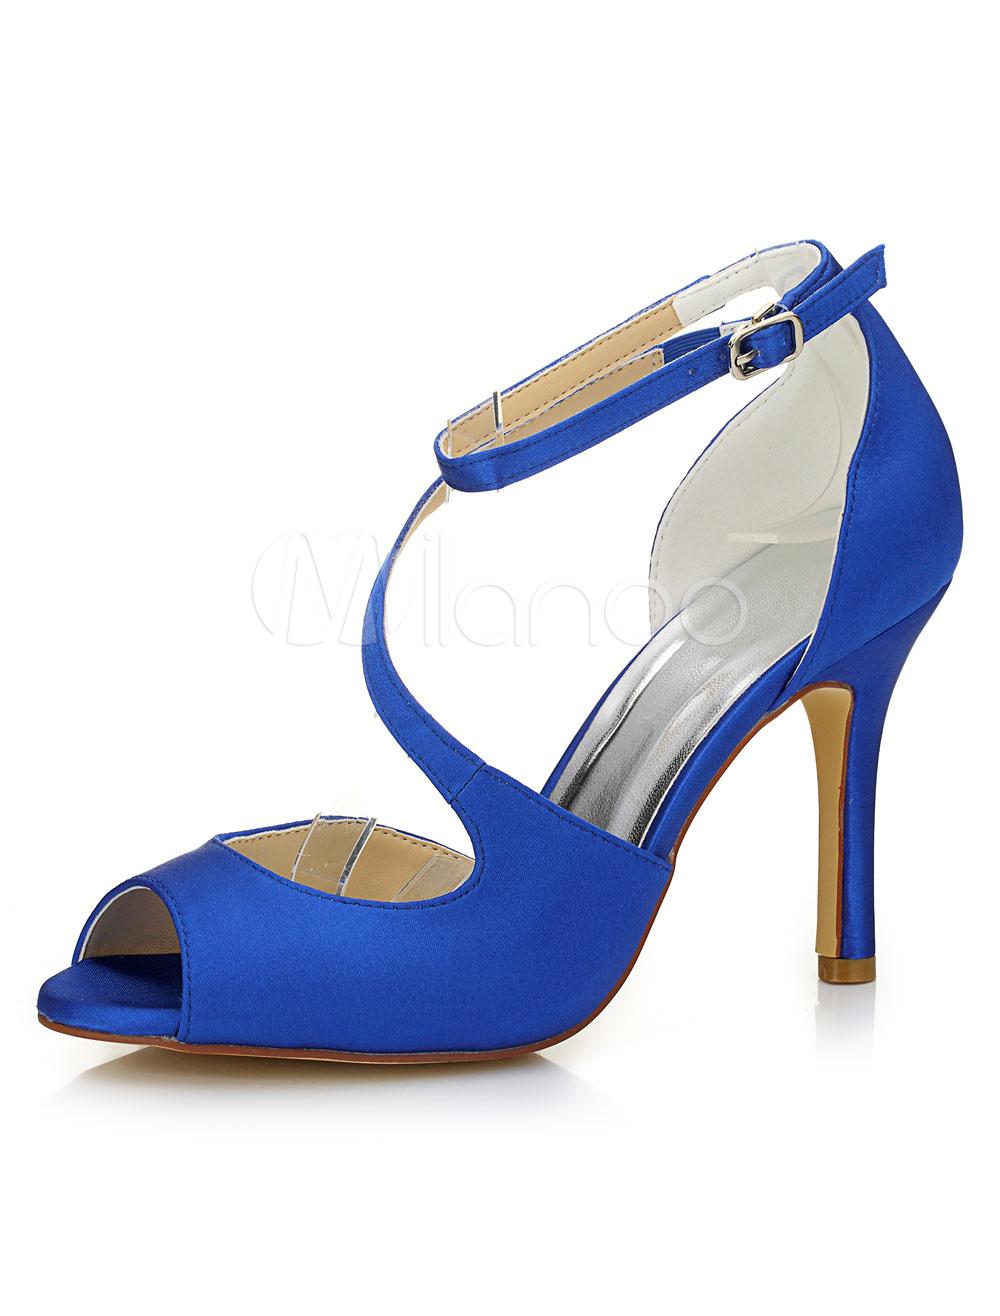 Blue Wedding Shoes Peep Sandals Women's High Heel Ankle Strap Stiletto Satin Bridal Shoes